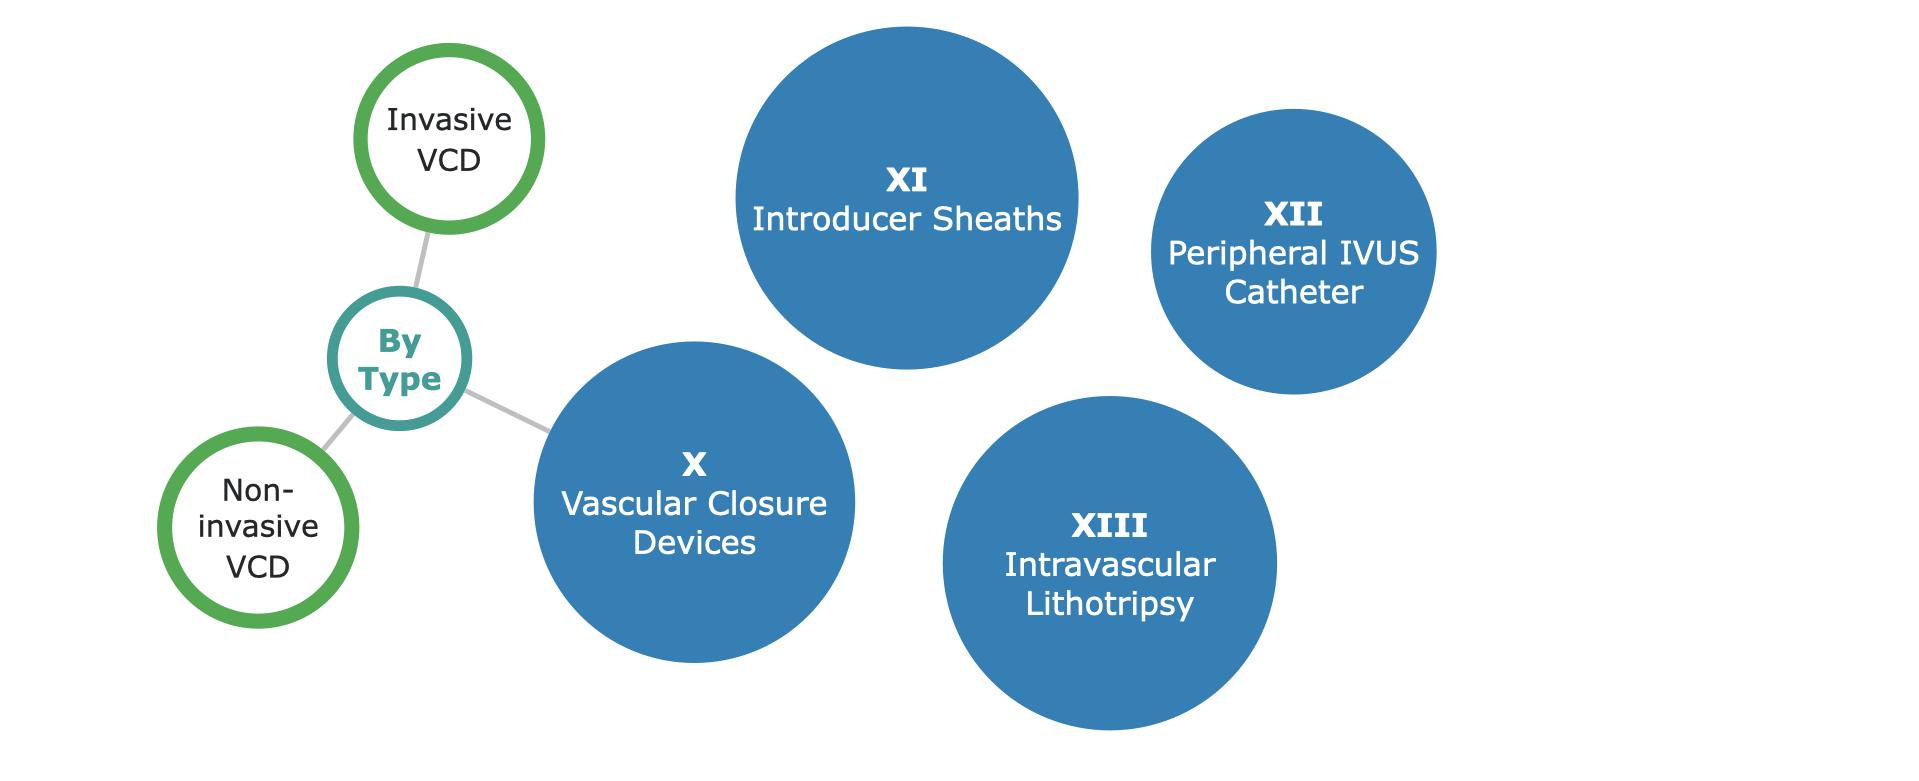 Global Peripheral Vascular Market Segmentation - 3